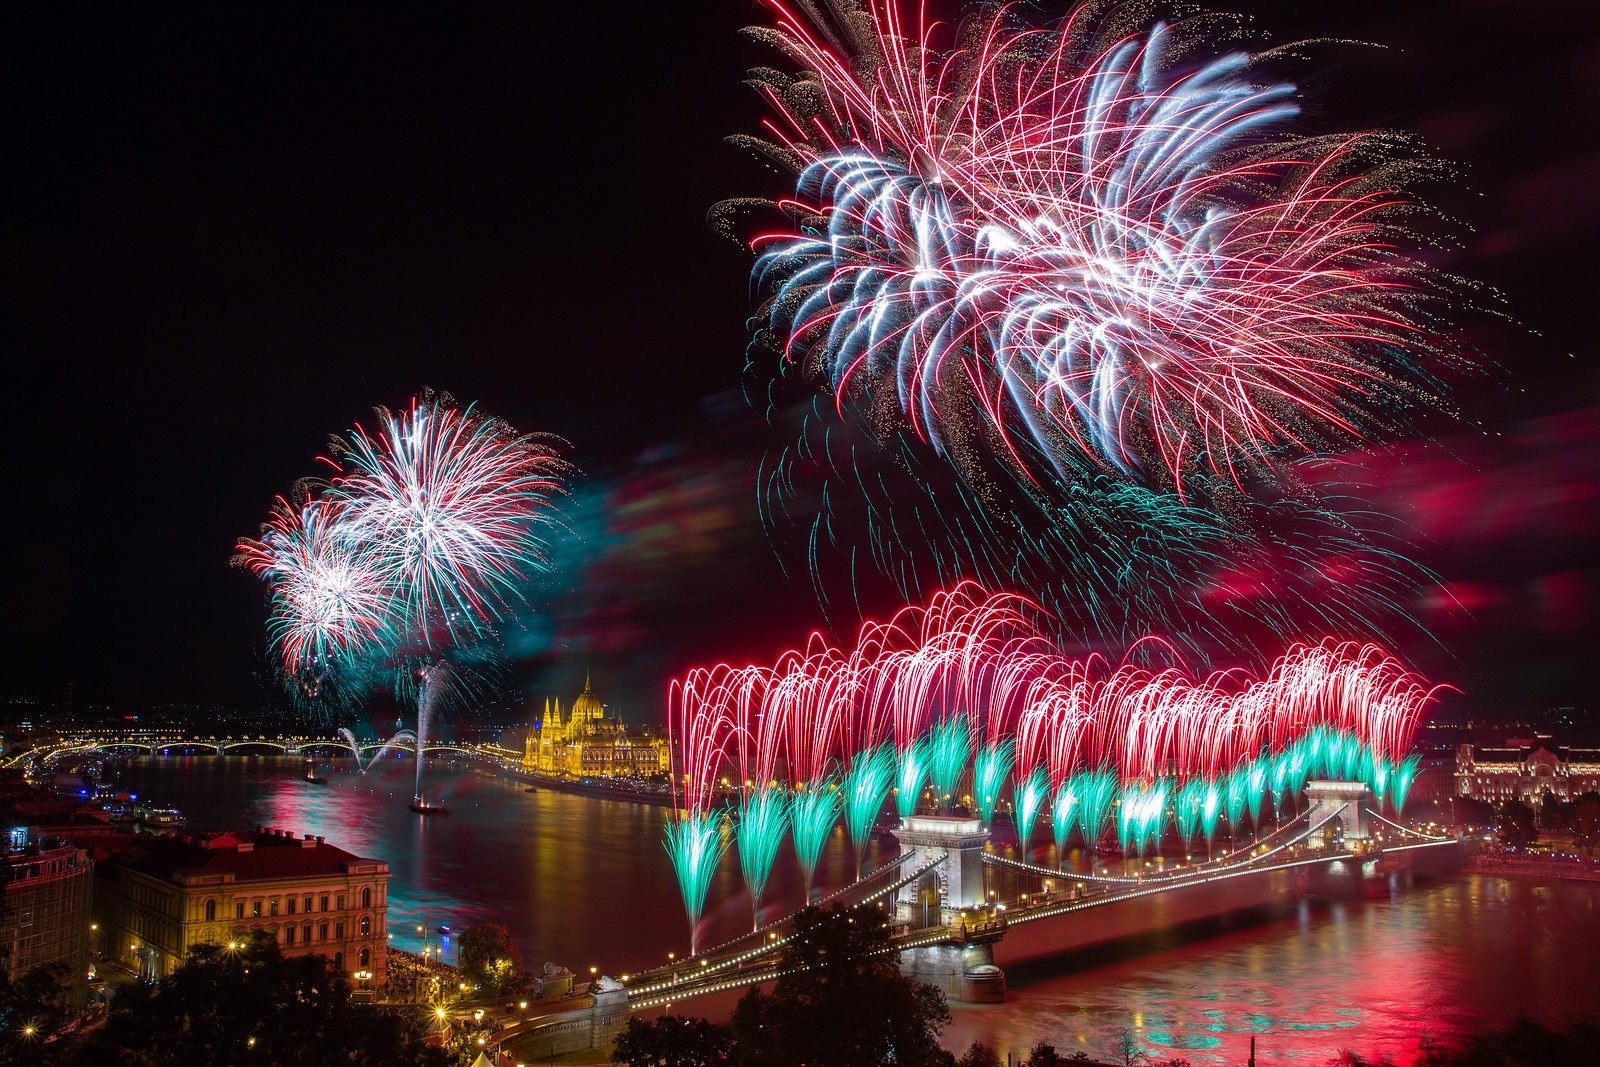 budapest fireworks st stephen day chain bridge national